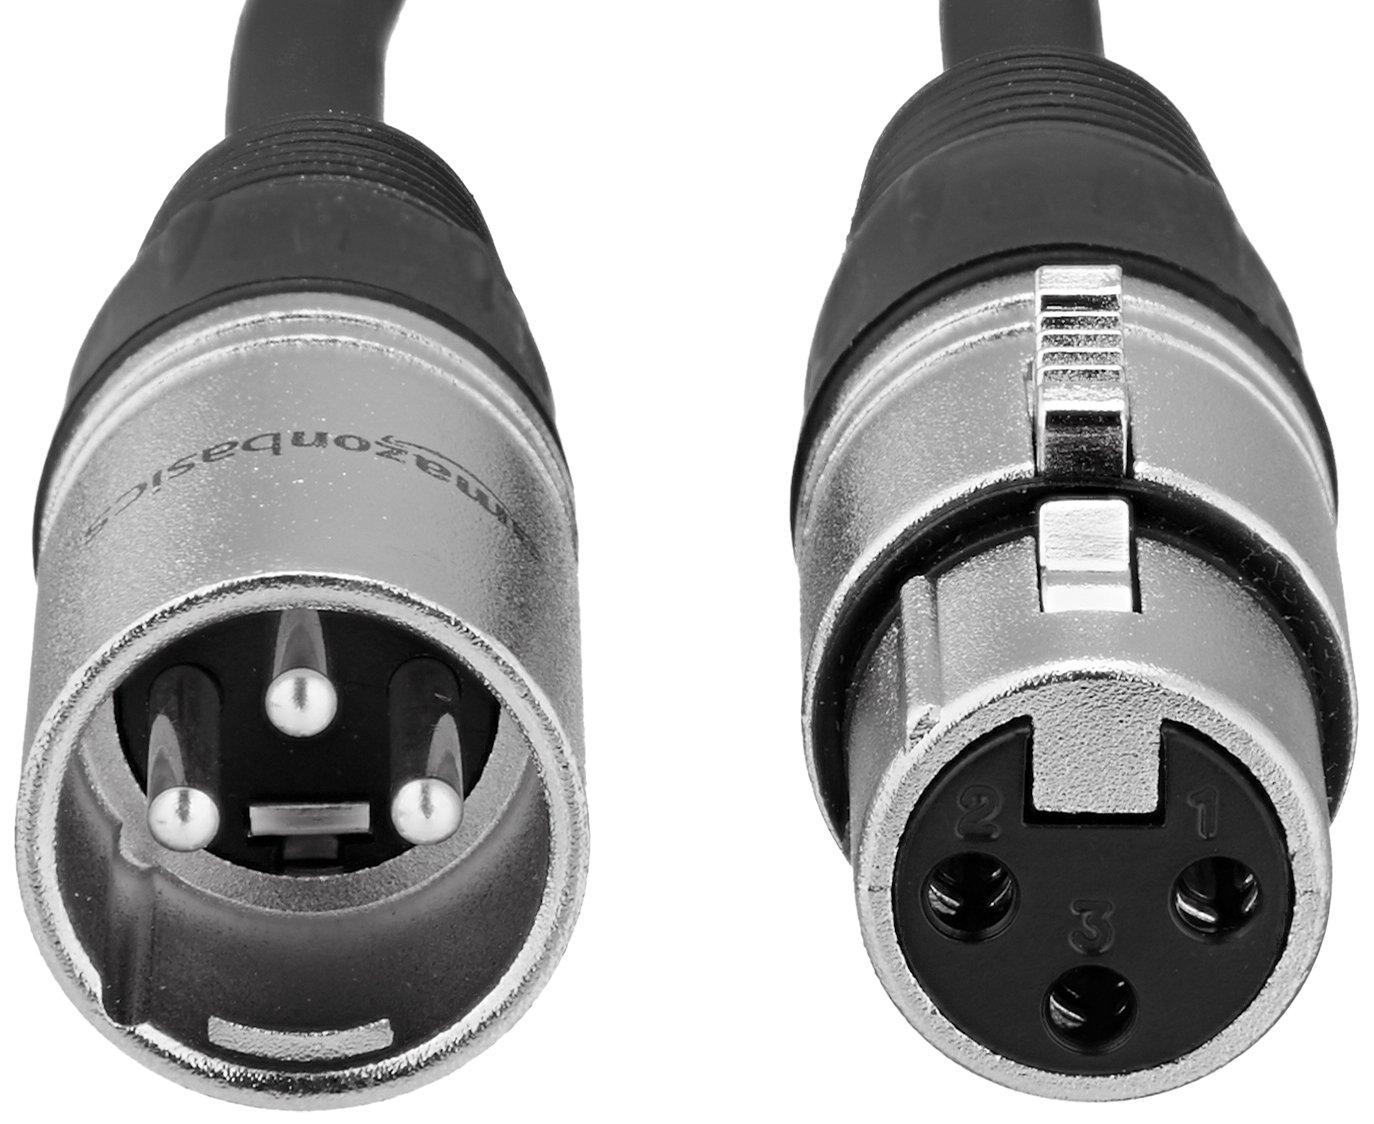 AmazonBasics XLR Male to Female Microphone Cable - 50 Feet by AmazonBasics (Image #2)